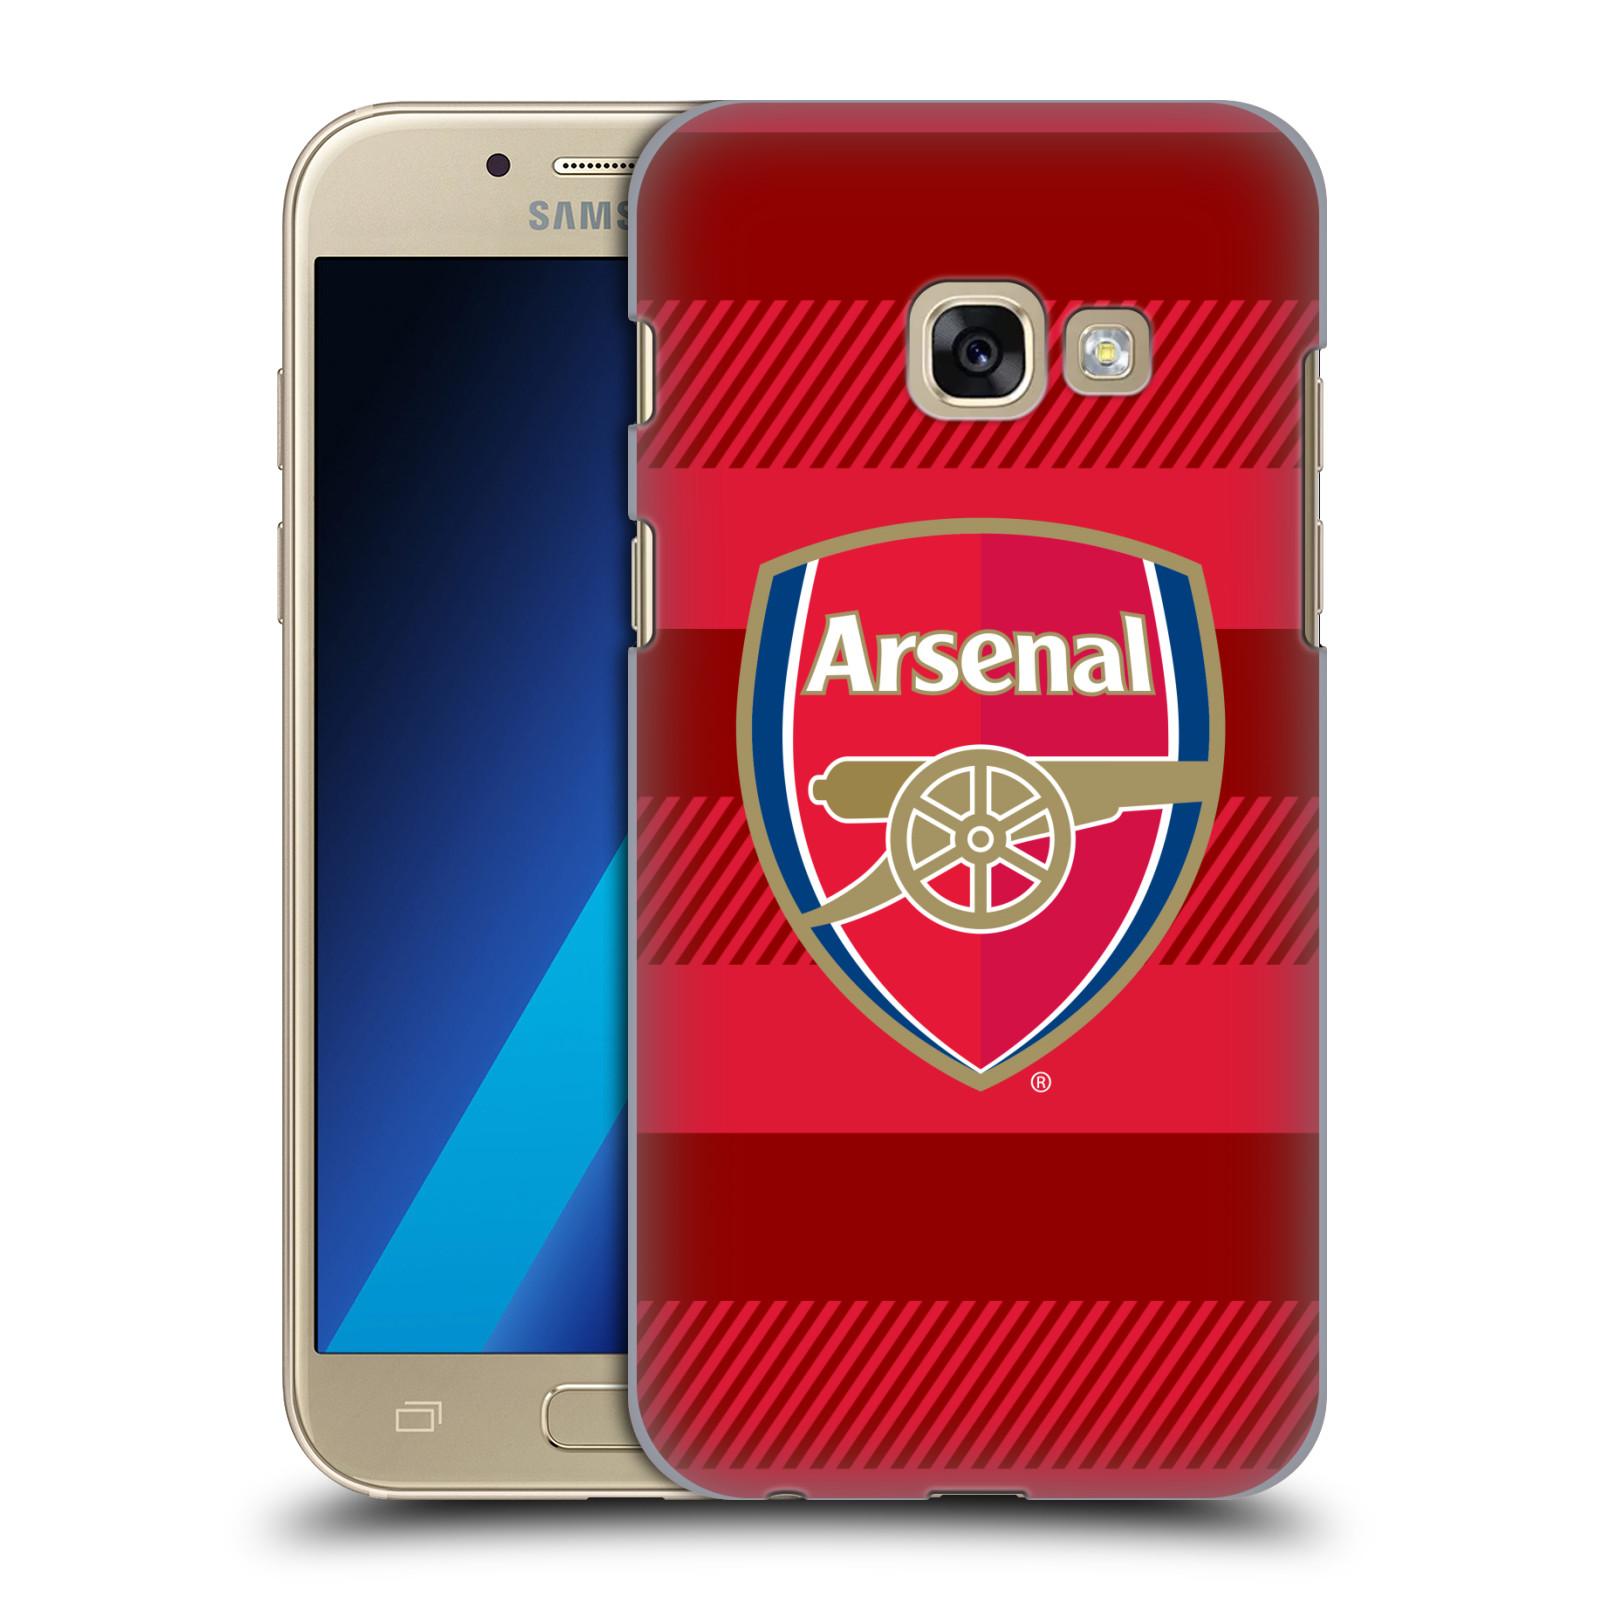 Plastové pouzdro na mobil Samsung Galaxy A3 (2017) - Head Case - Arsenal FC - Logo s pruhy